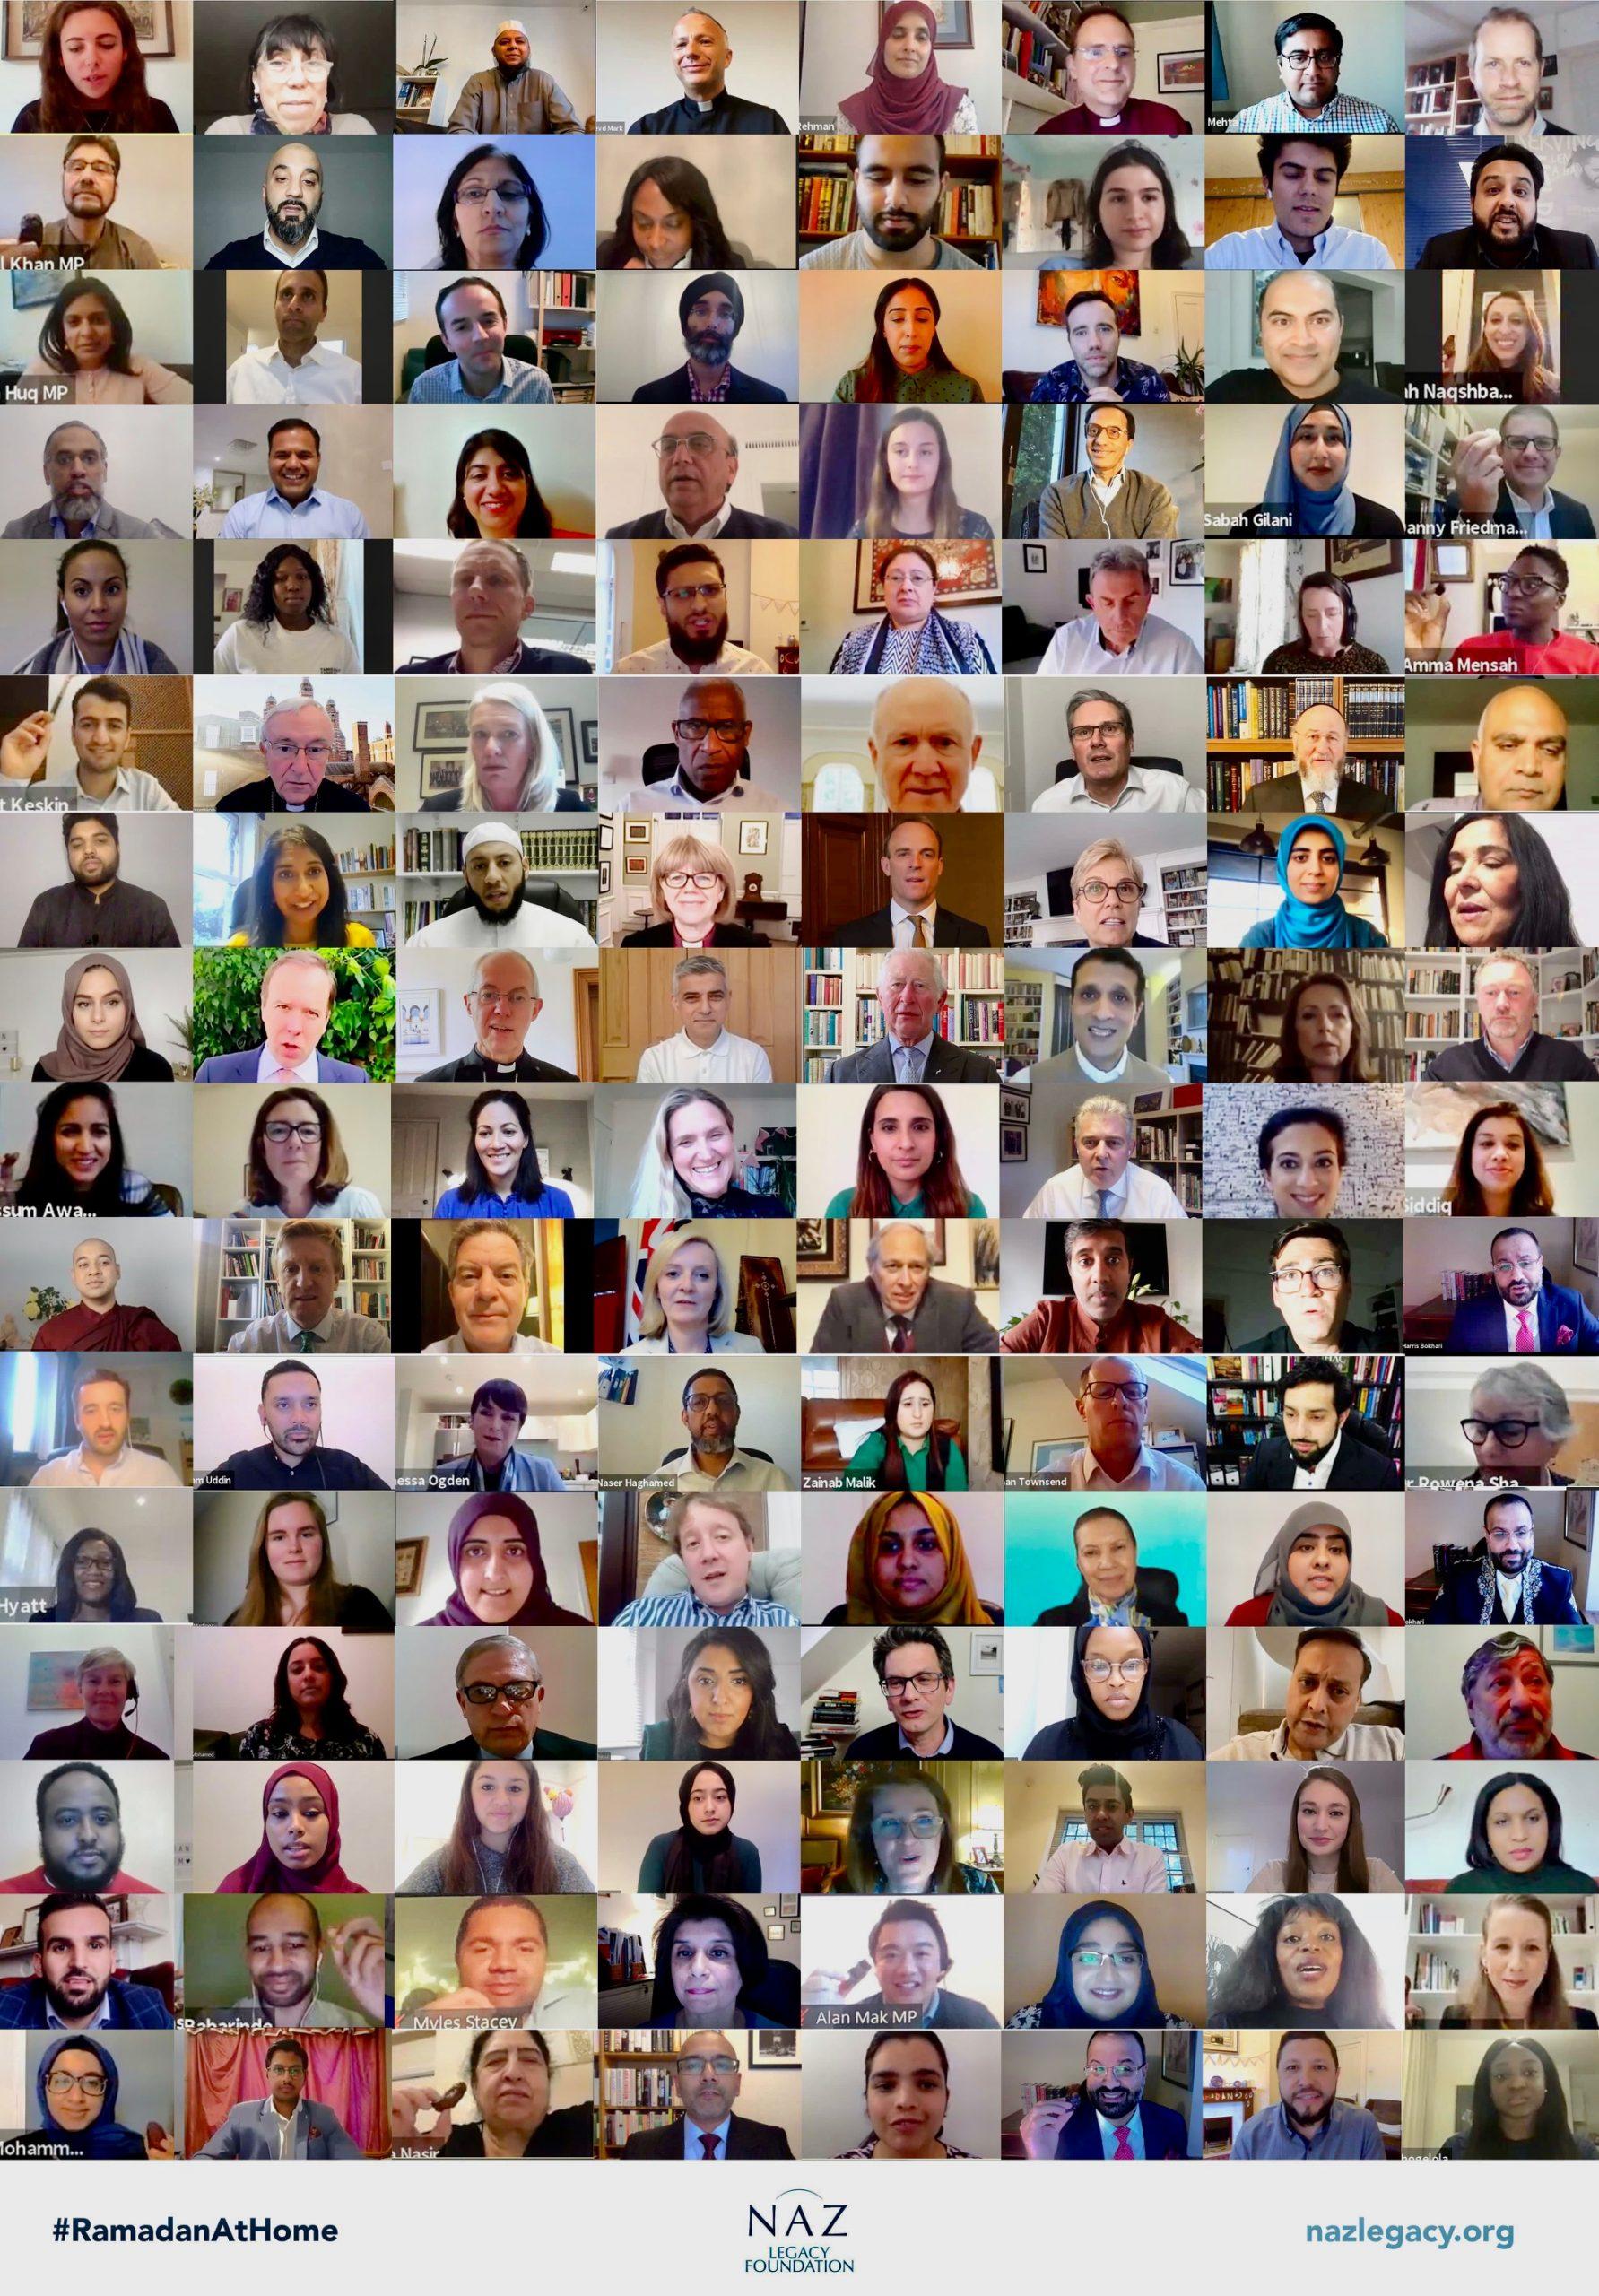 Record Breaking Virtual Iftars unites over 75,000 during Ramadan